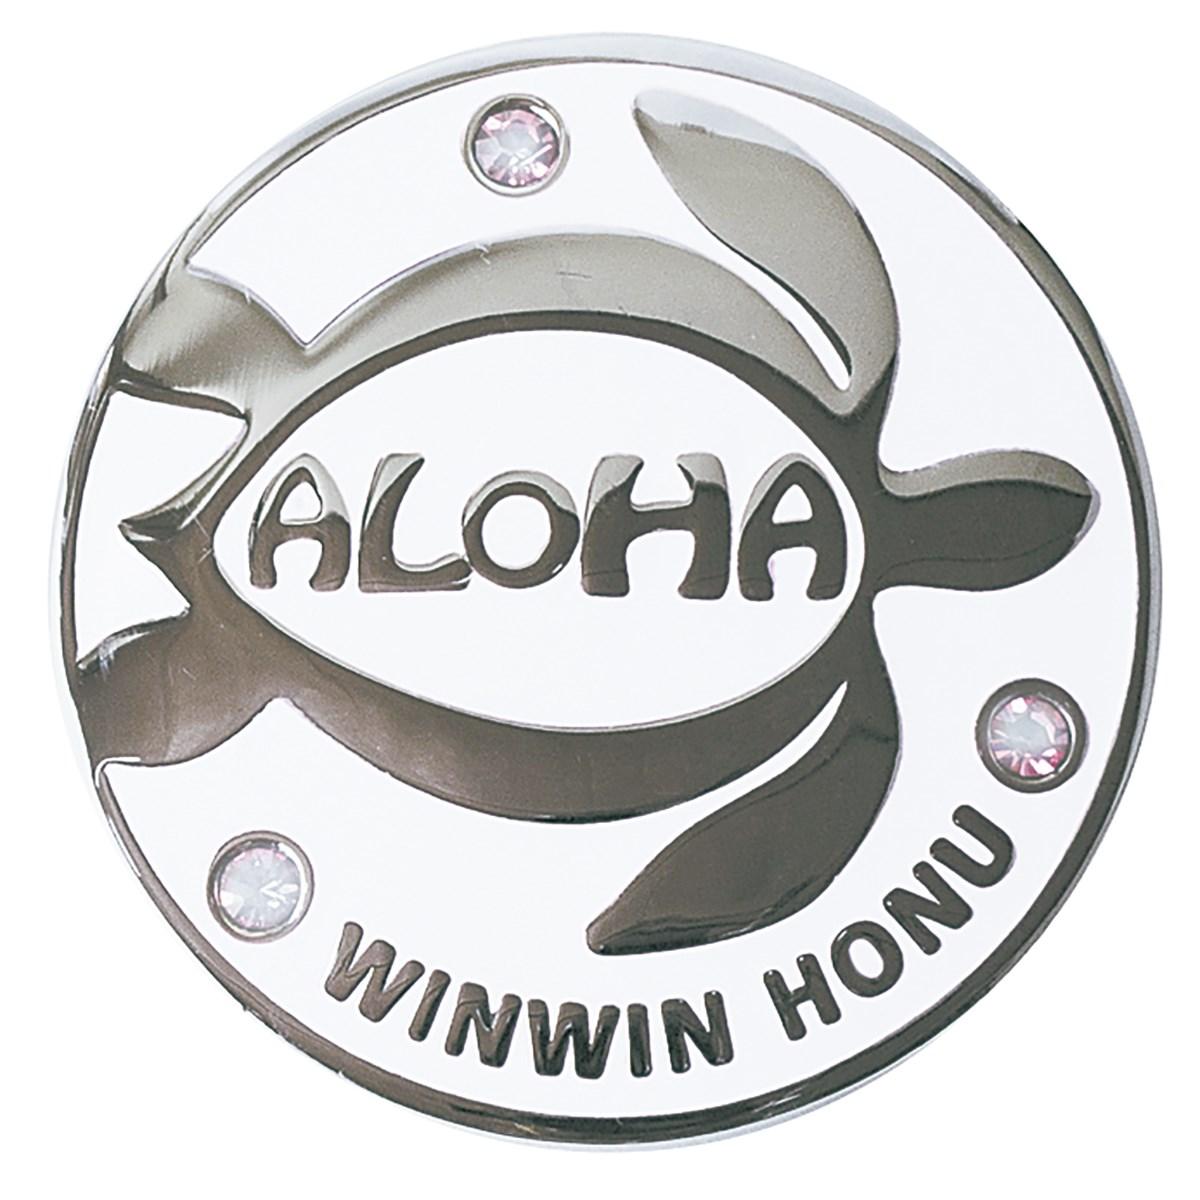 WINWIN STYLE ALOHA HONU マーカー